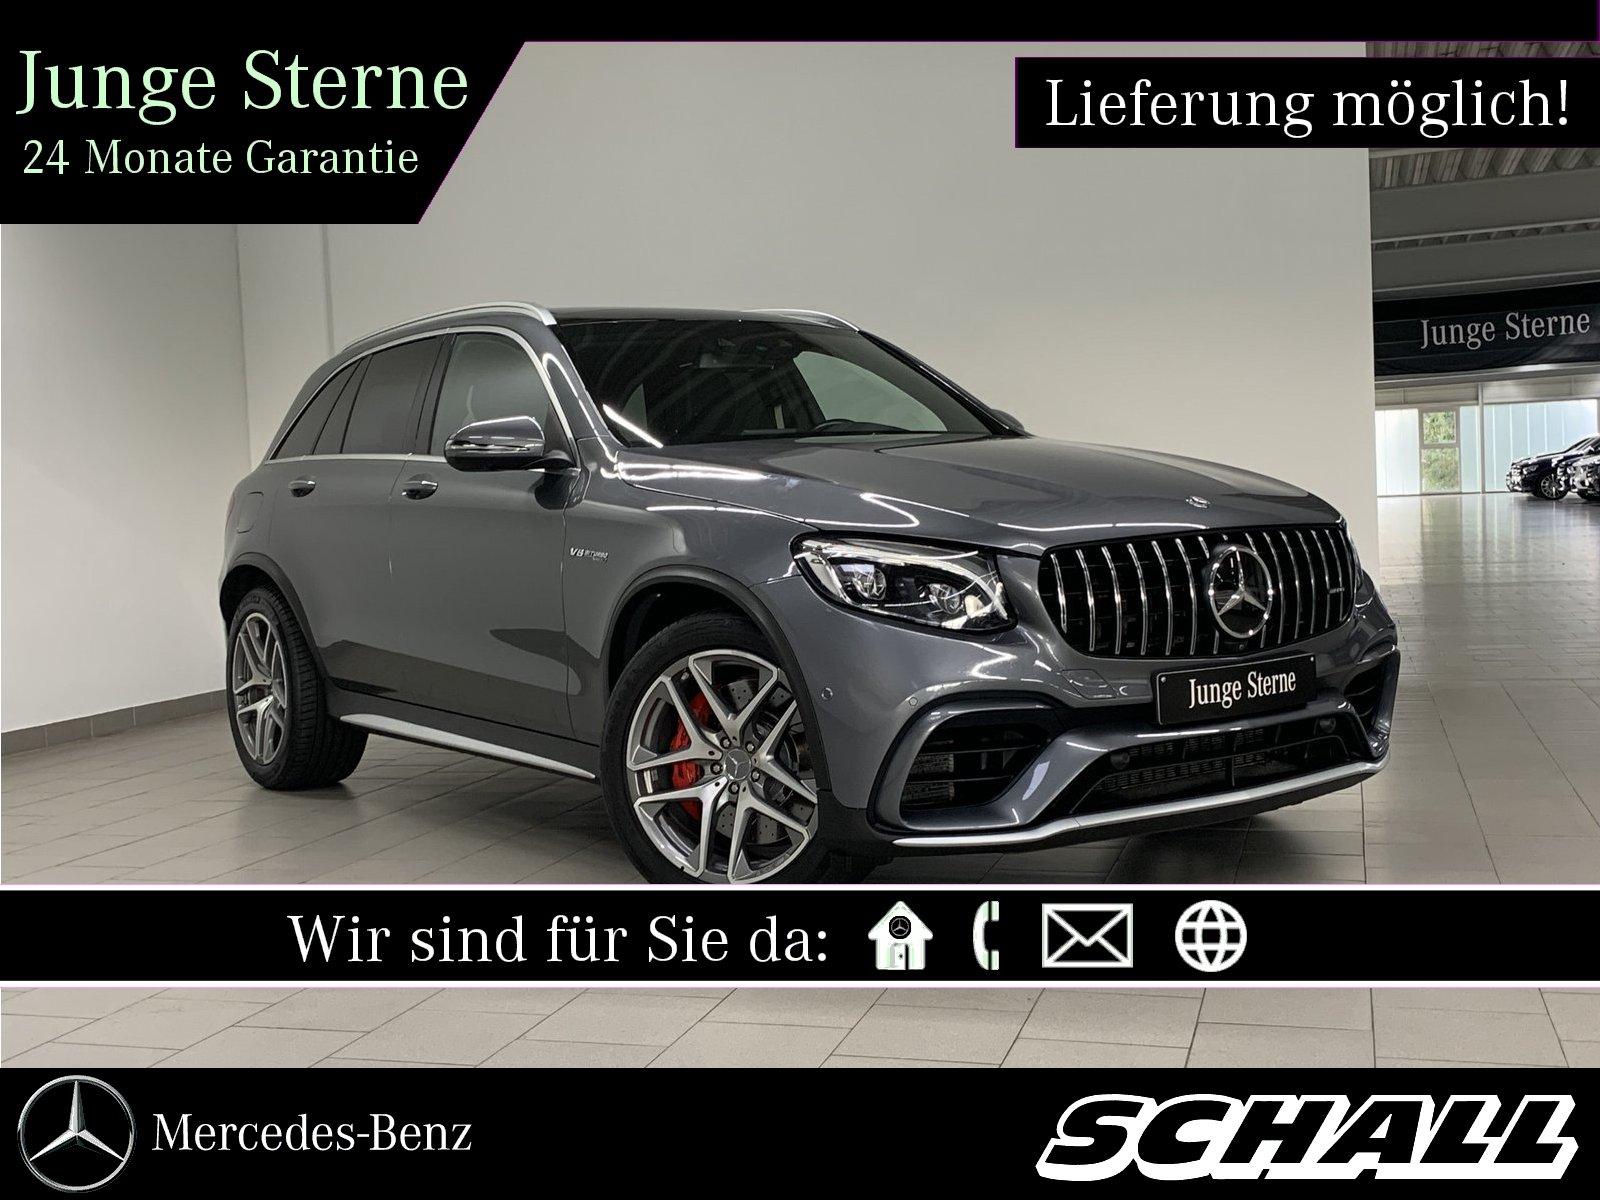 "Mercedes-Benz GLC 63 S 4M+ AMG PANO+DISTR+AHK+20""AMG+LED+360°, Jahr 2018, petrol"